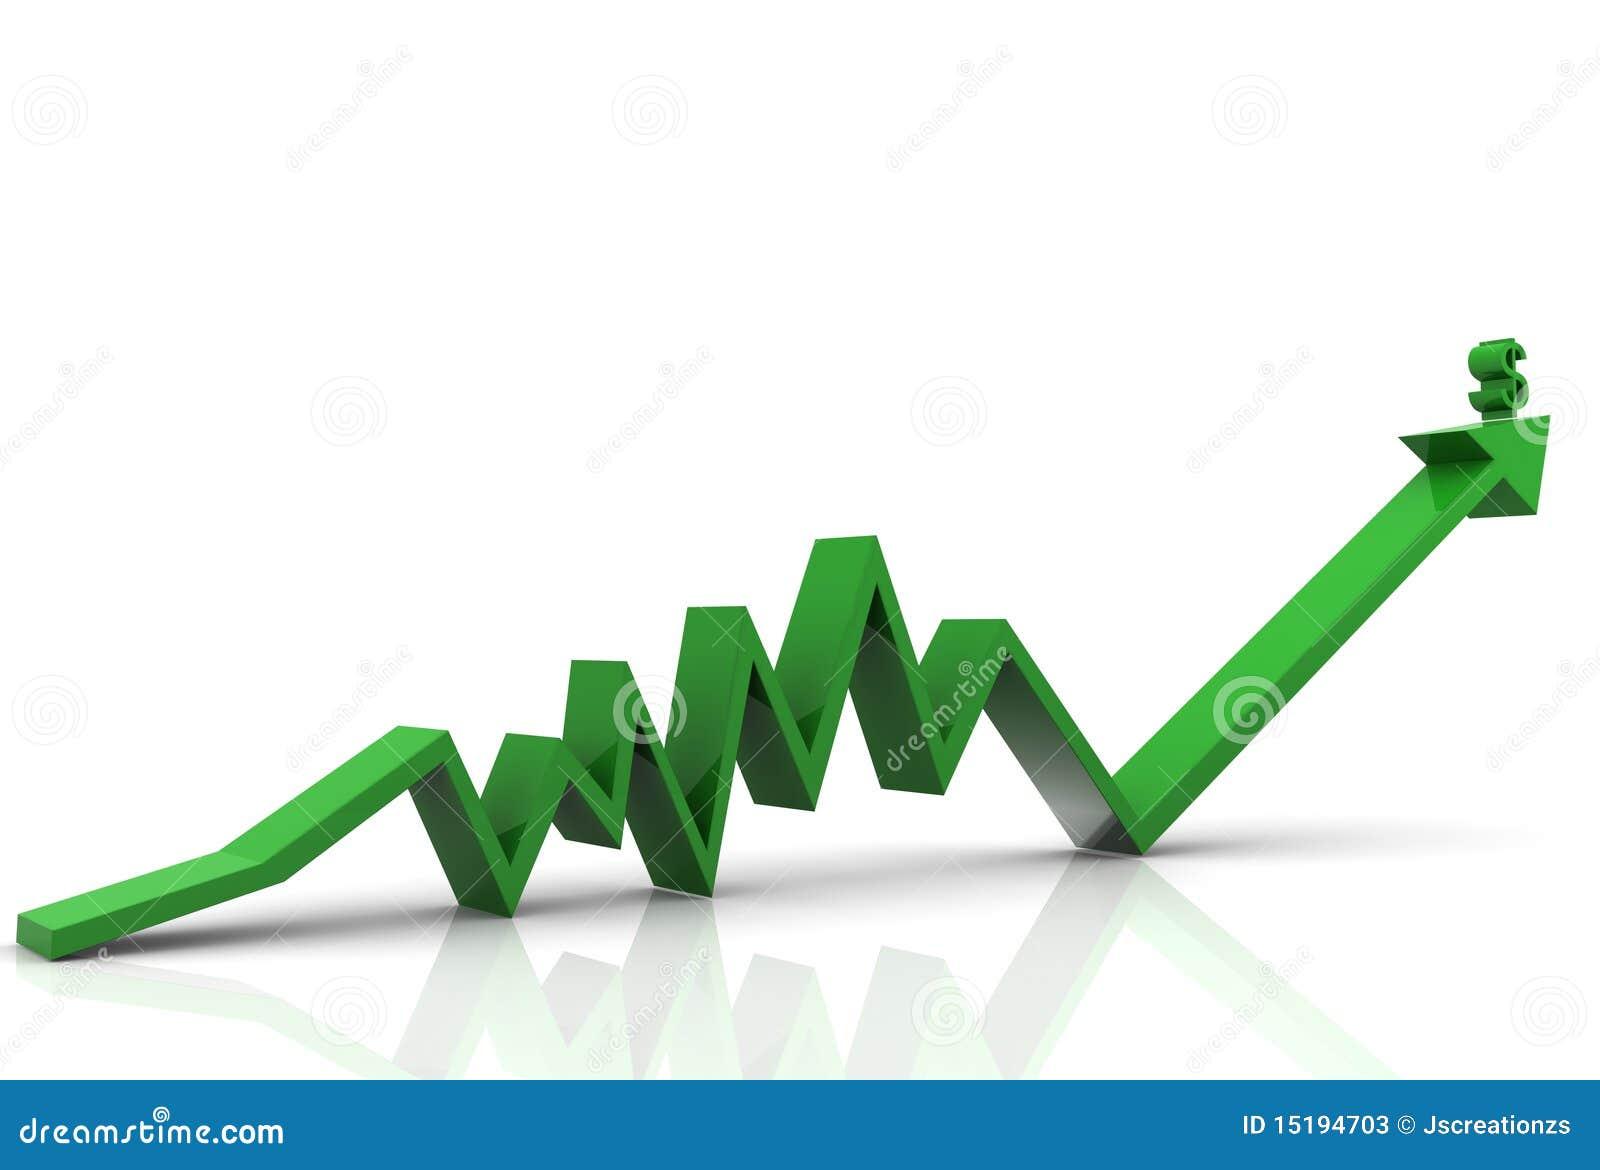 Green Verification - 491501